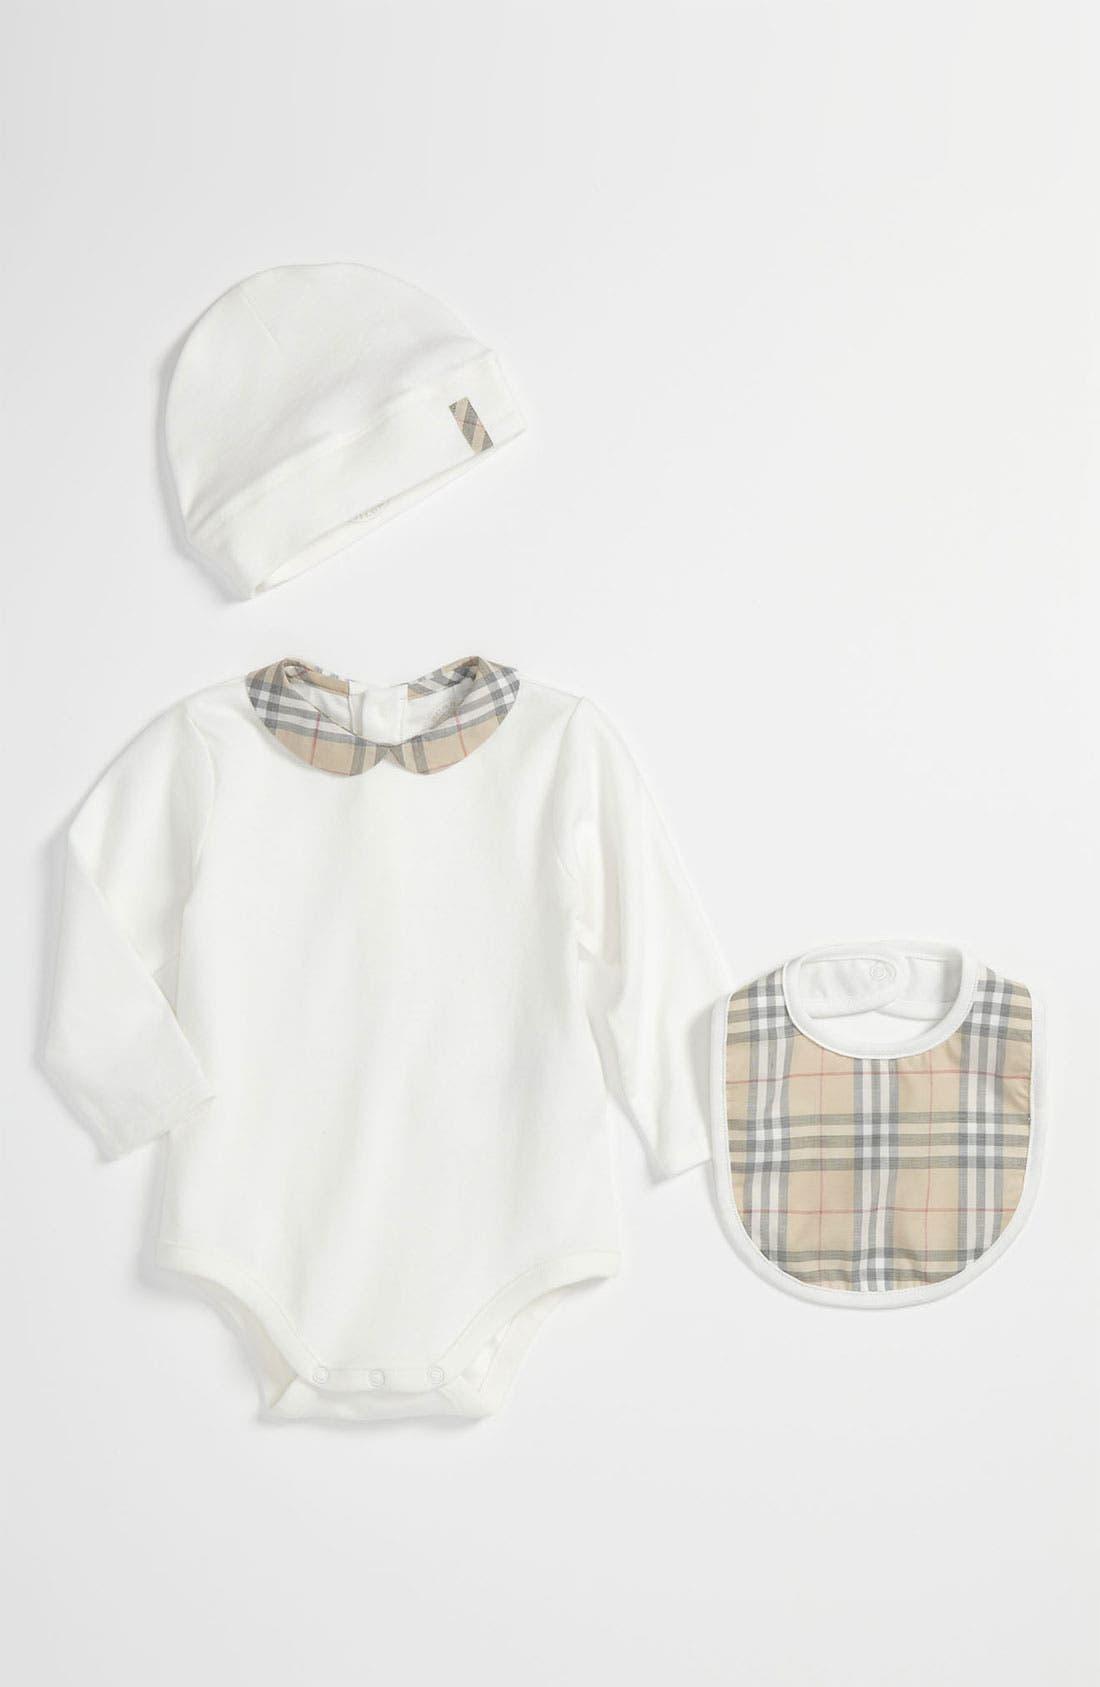 Alternate Image 1 Selected - Burberry Bodysuit, Hat & Bib Set (Baby)